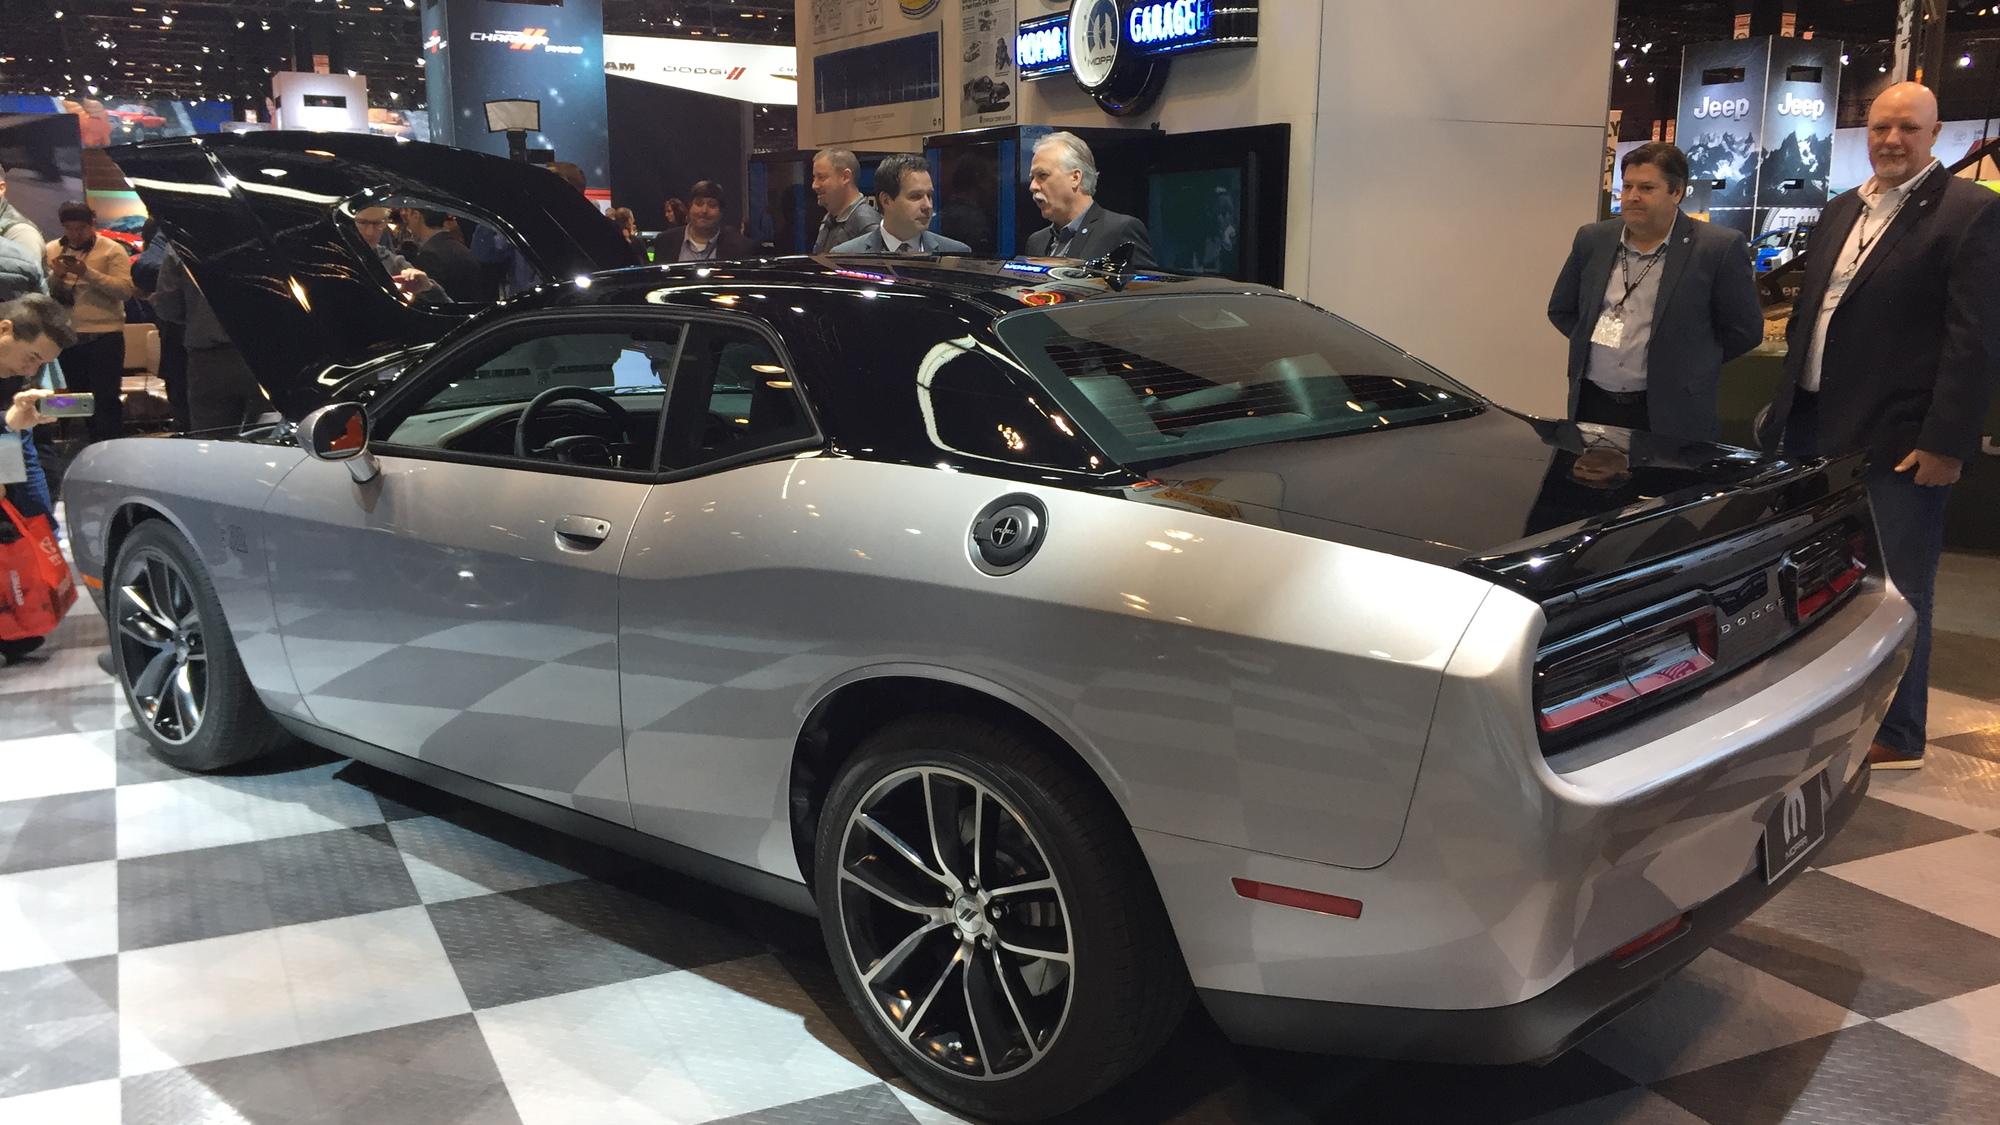 Mopar '17, 2017 Chicago auto show